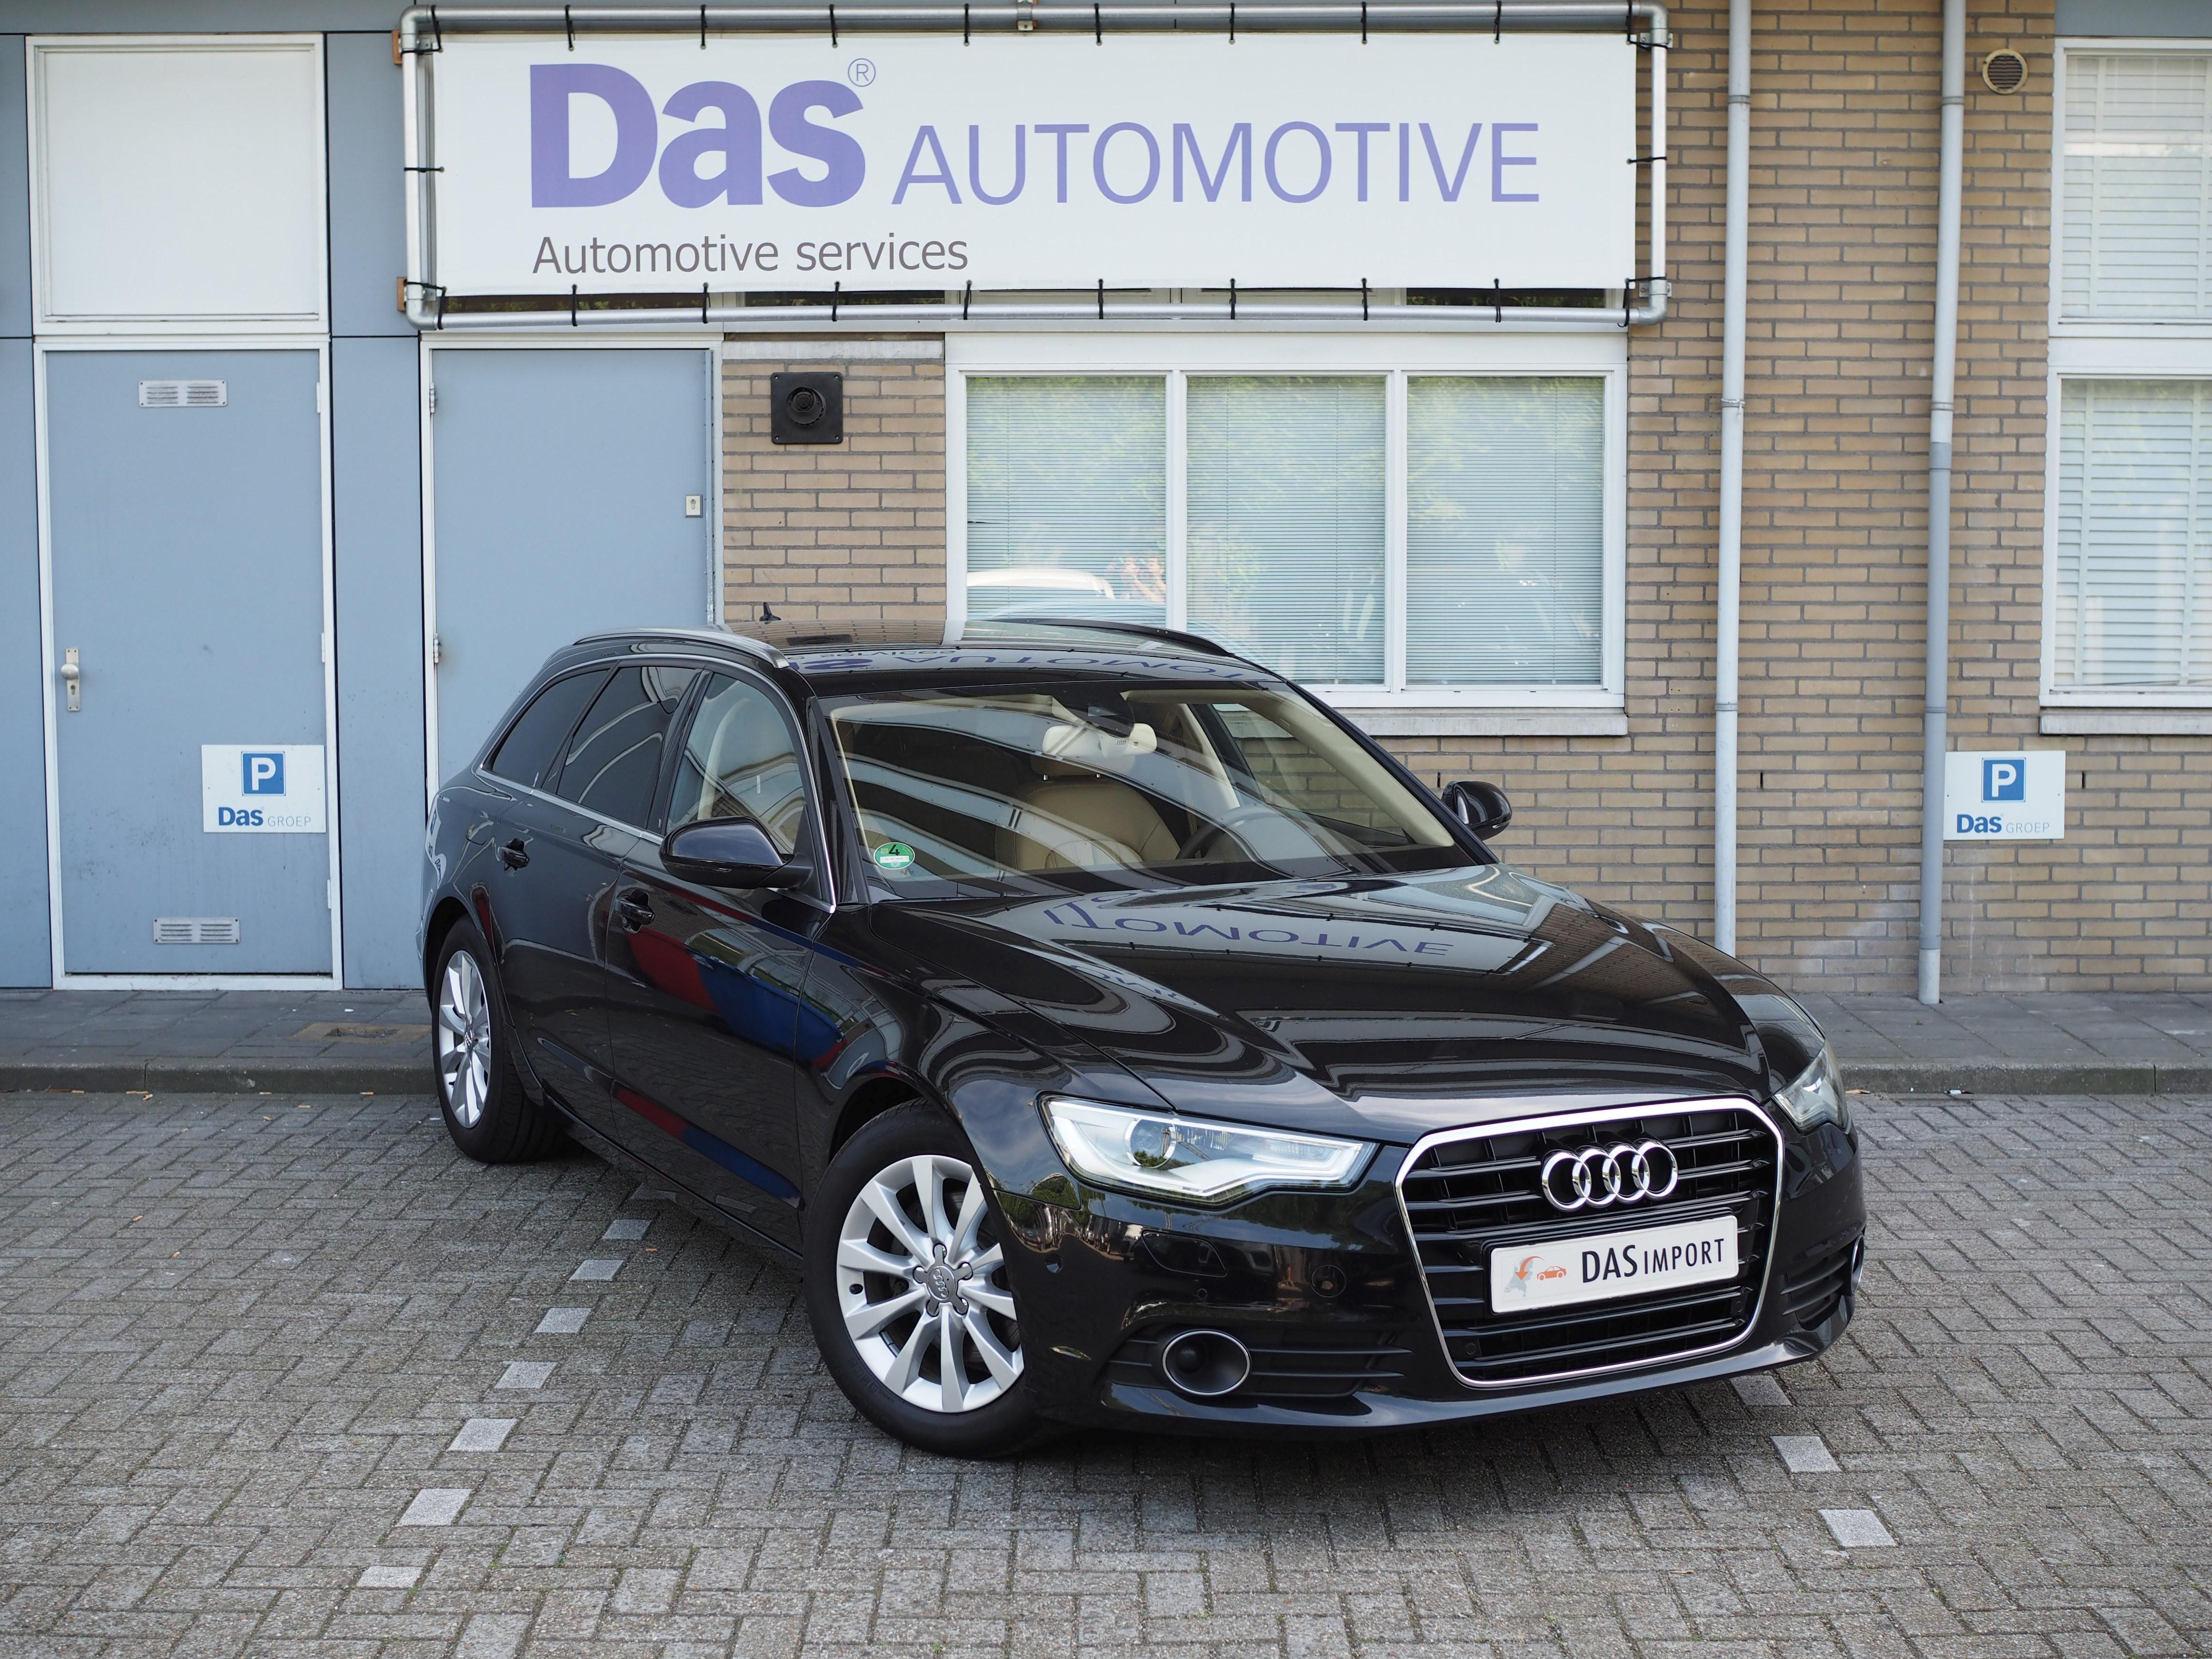 Importauto: Audi A6 Avant Diesel 2.0 TDI 140kW ultra S tronic 10/2014